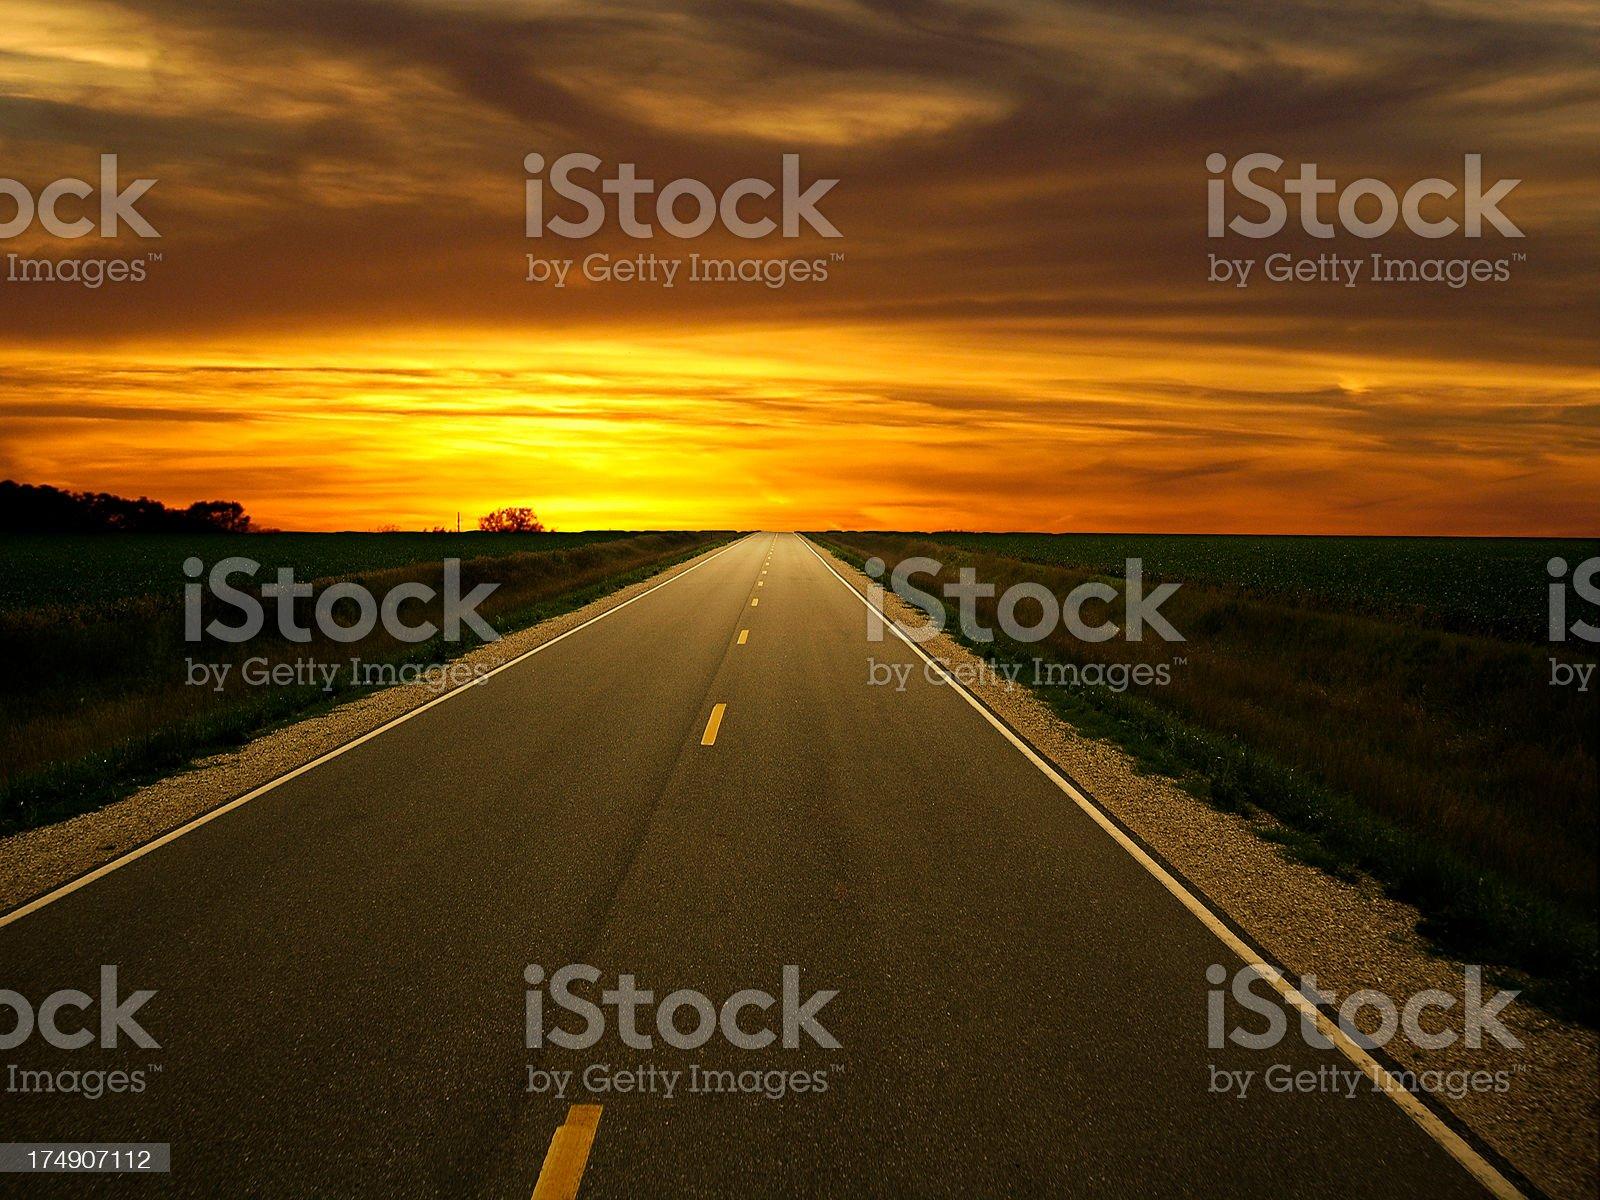 Sunset Highway Horizon royalty-free stock photo